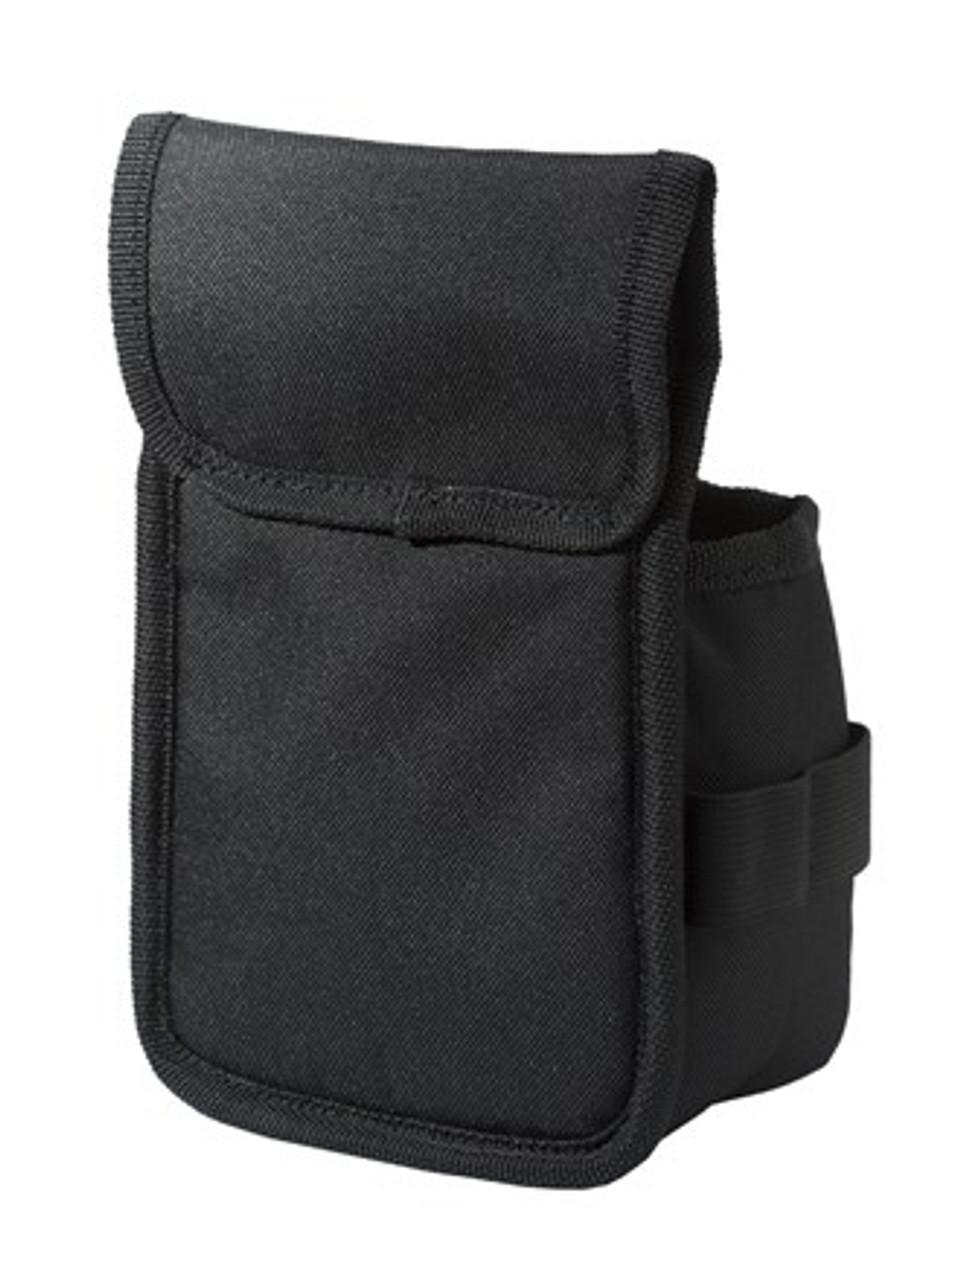 Beretta Uniform Pro C, Hunting, Outdoor & Shooting Cartridge Bag